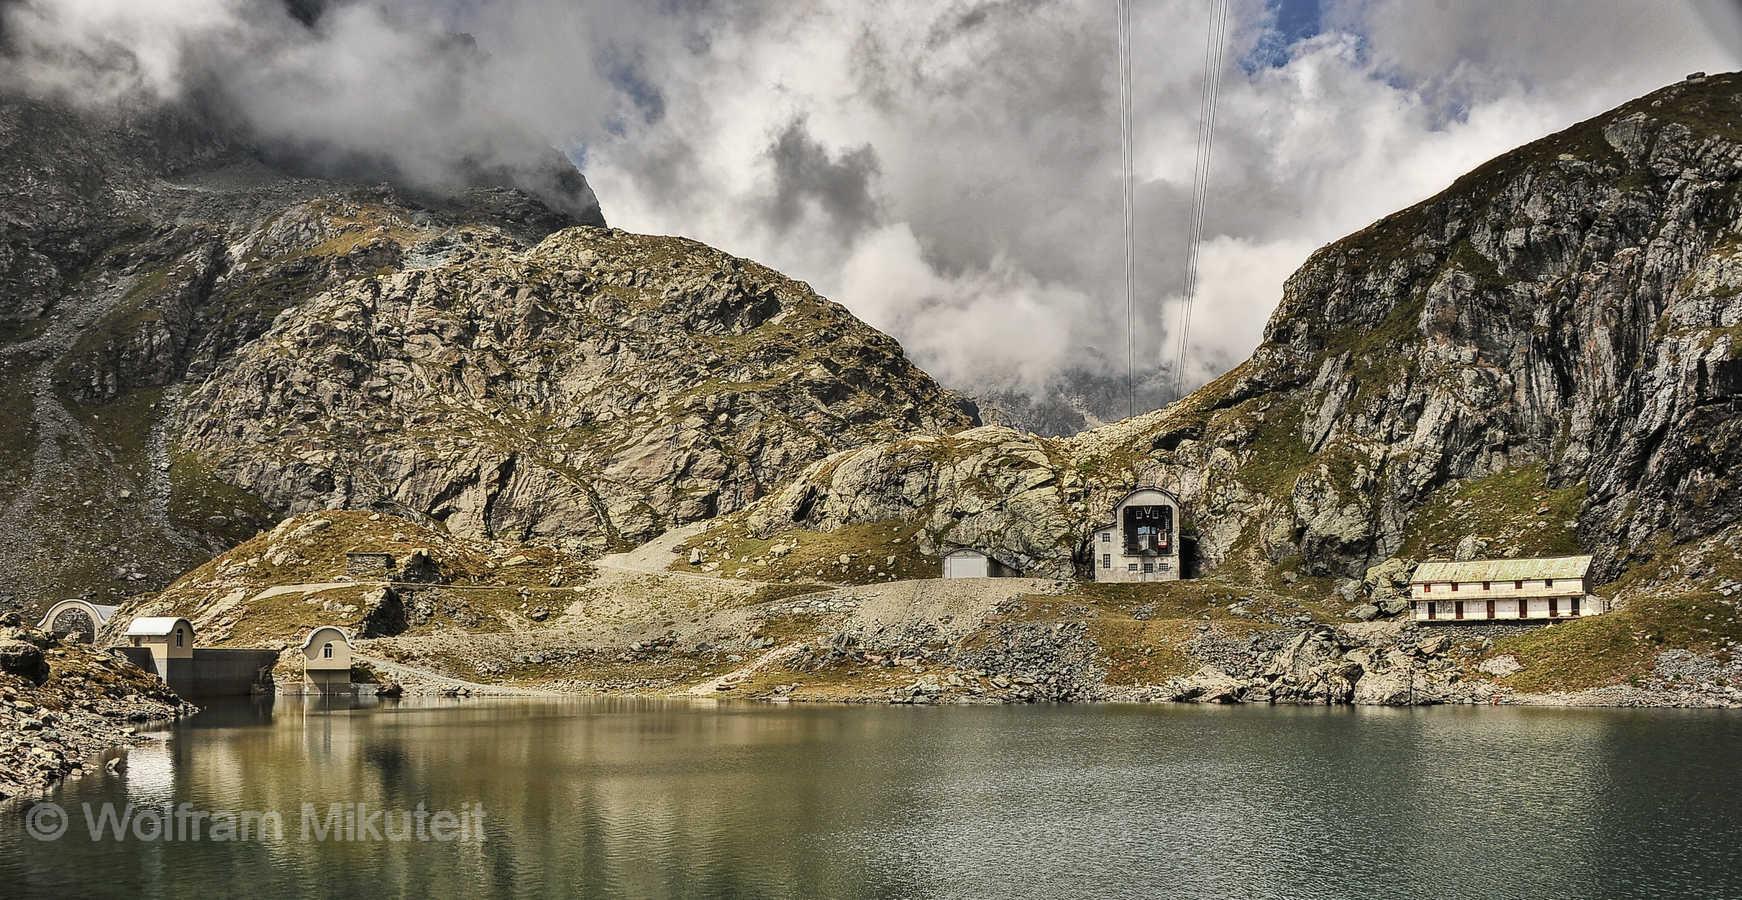 Lago Dietro la Torre - Foto: © Wolfram Mikuteit